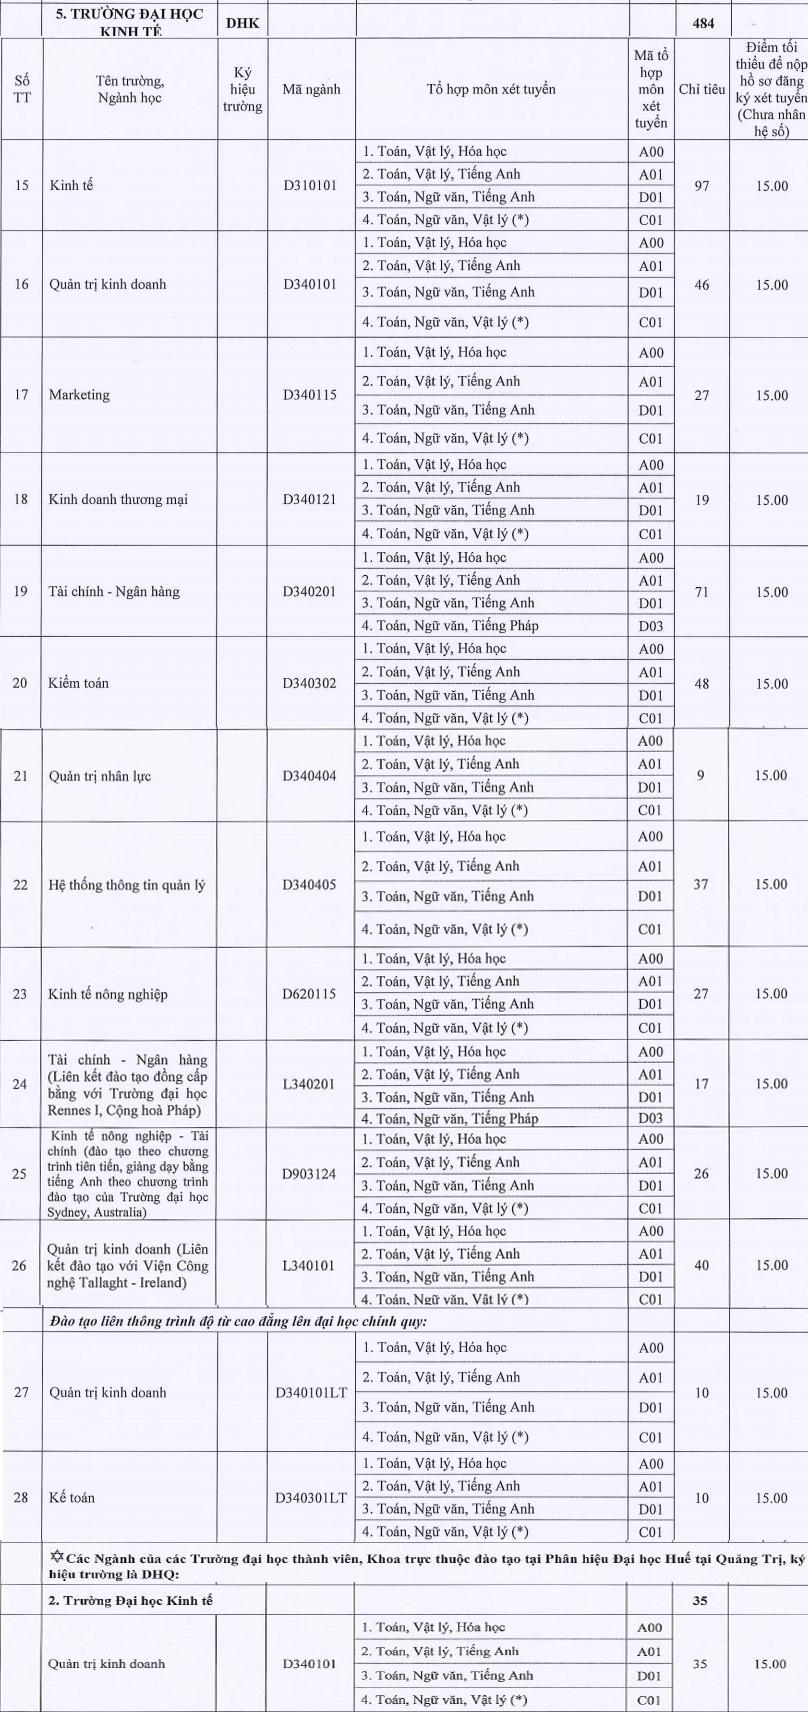 Dai hoc Kinh te Hue thong bao xet tuyen NVBS dot 1 nam 2016